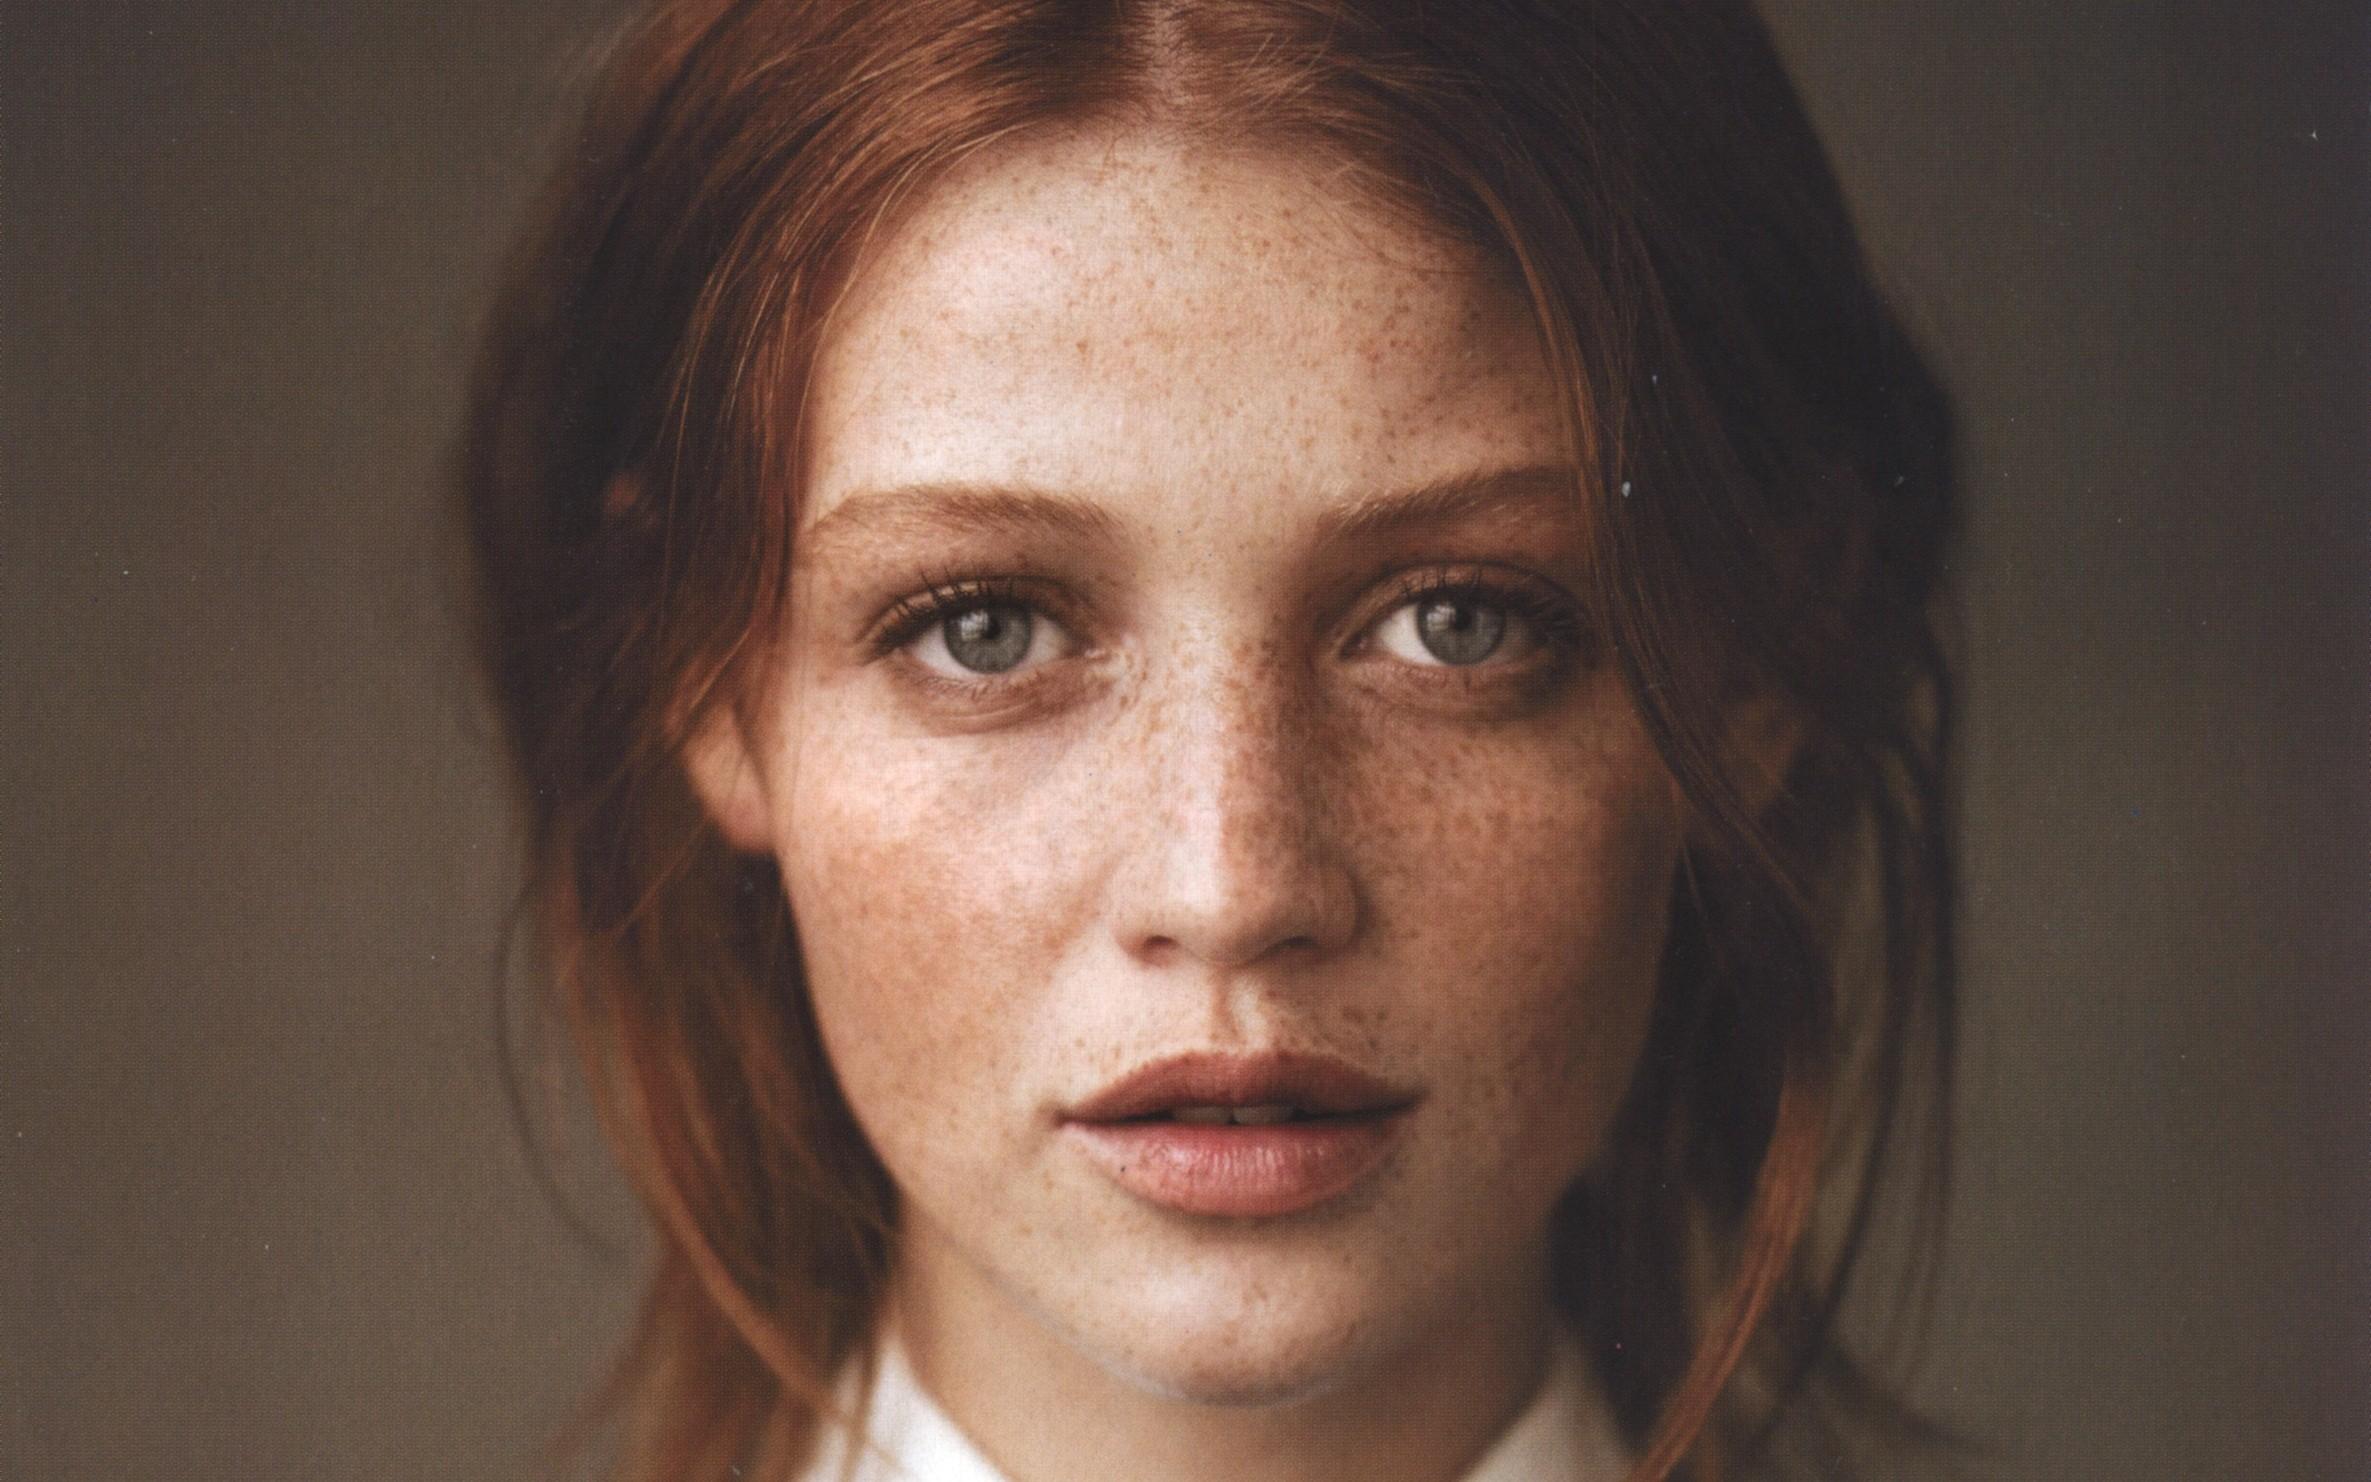 Cintia Dicker Face Freckles Wallpaper 60439 2371x1482 Px